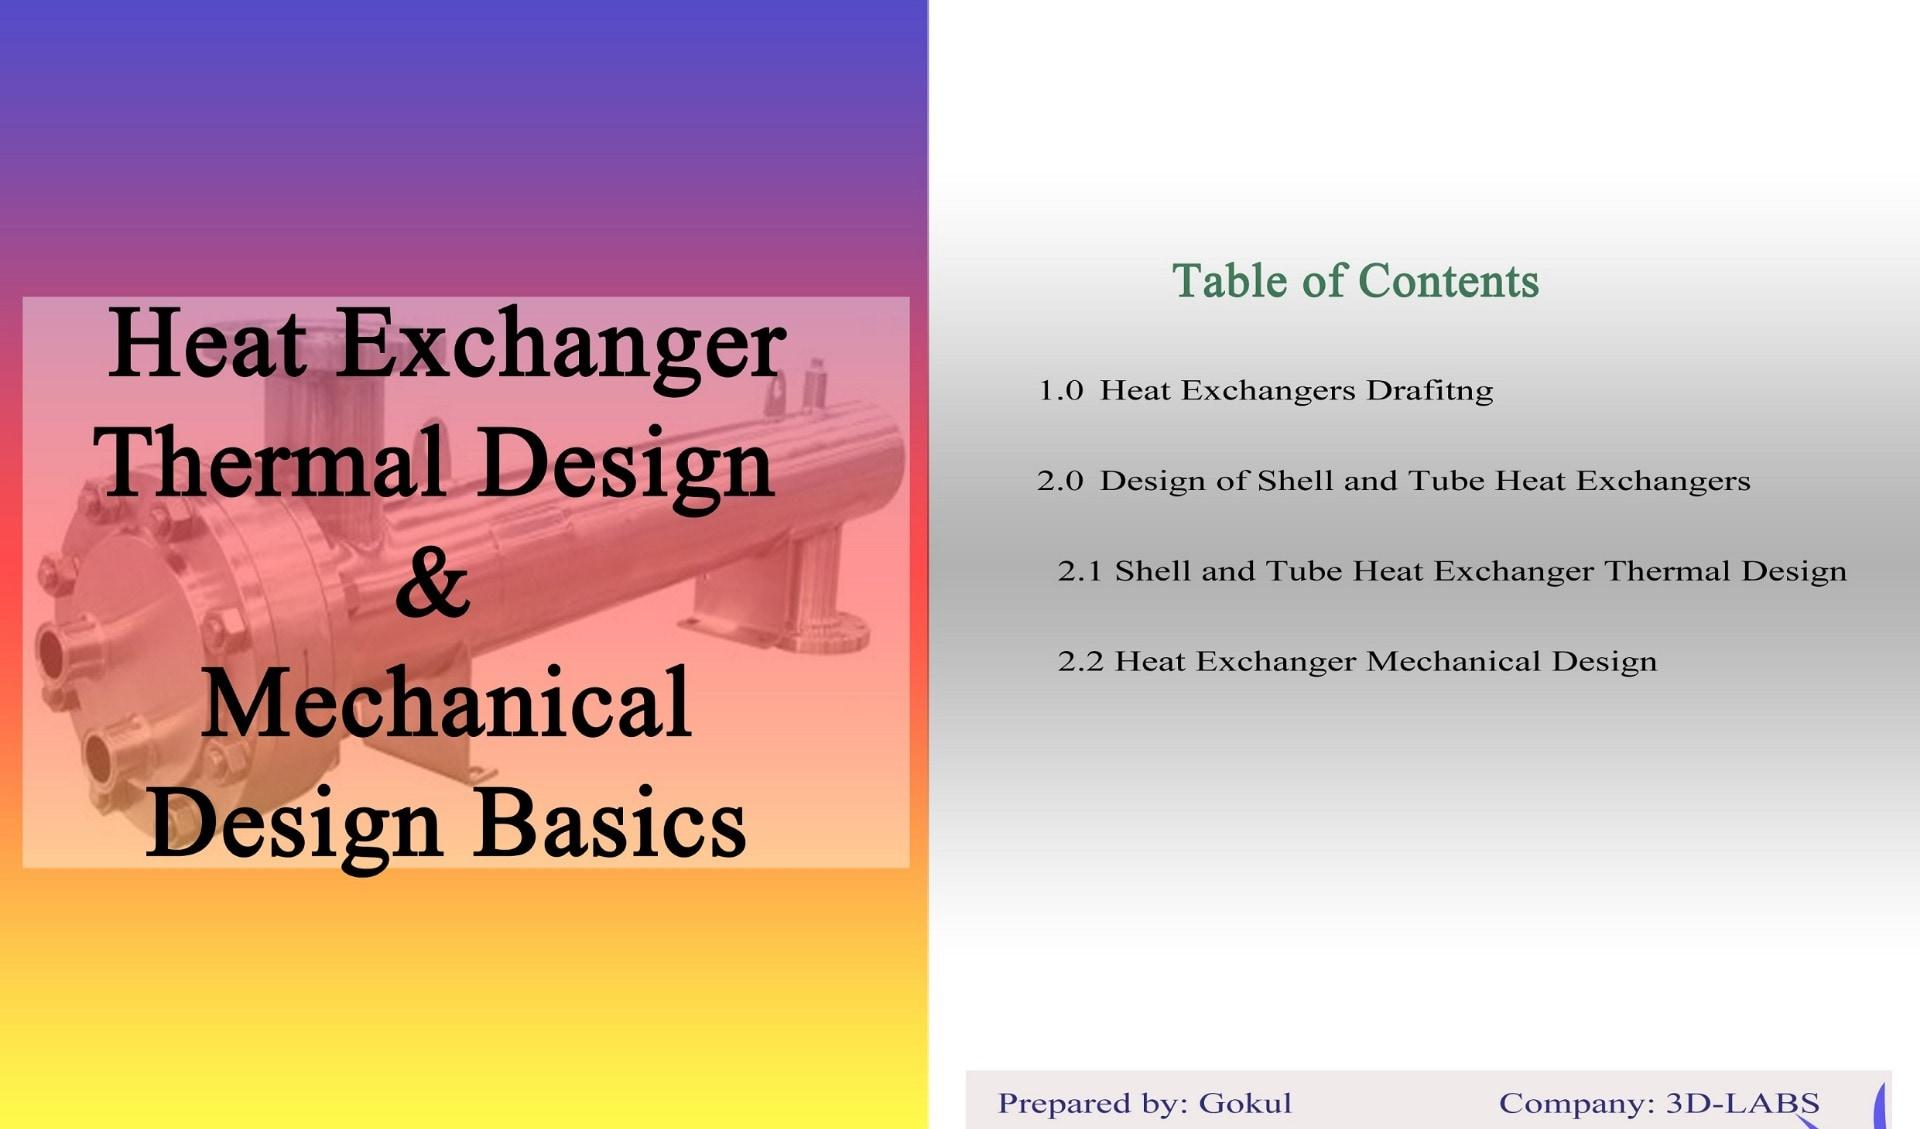 heat exchanger thermal design, mechanical design basics